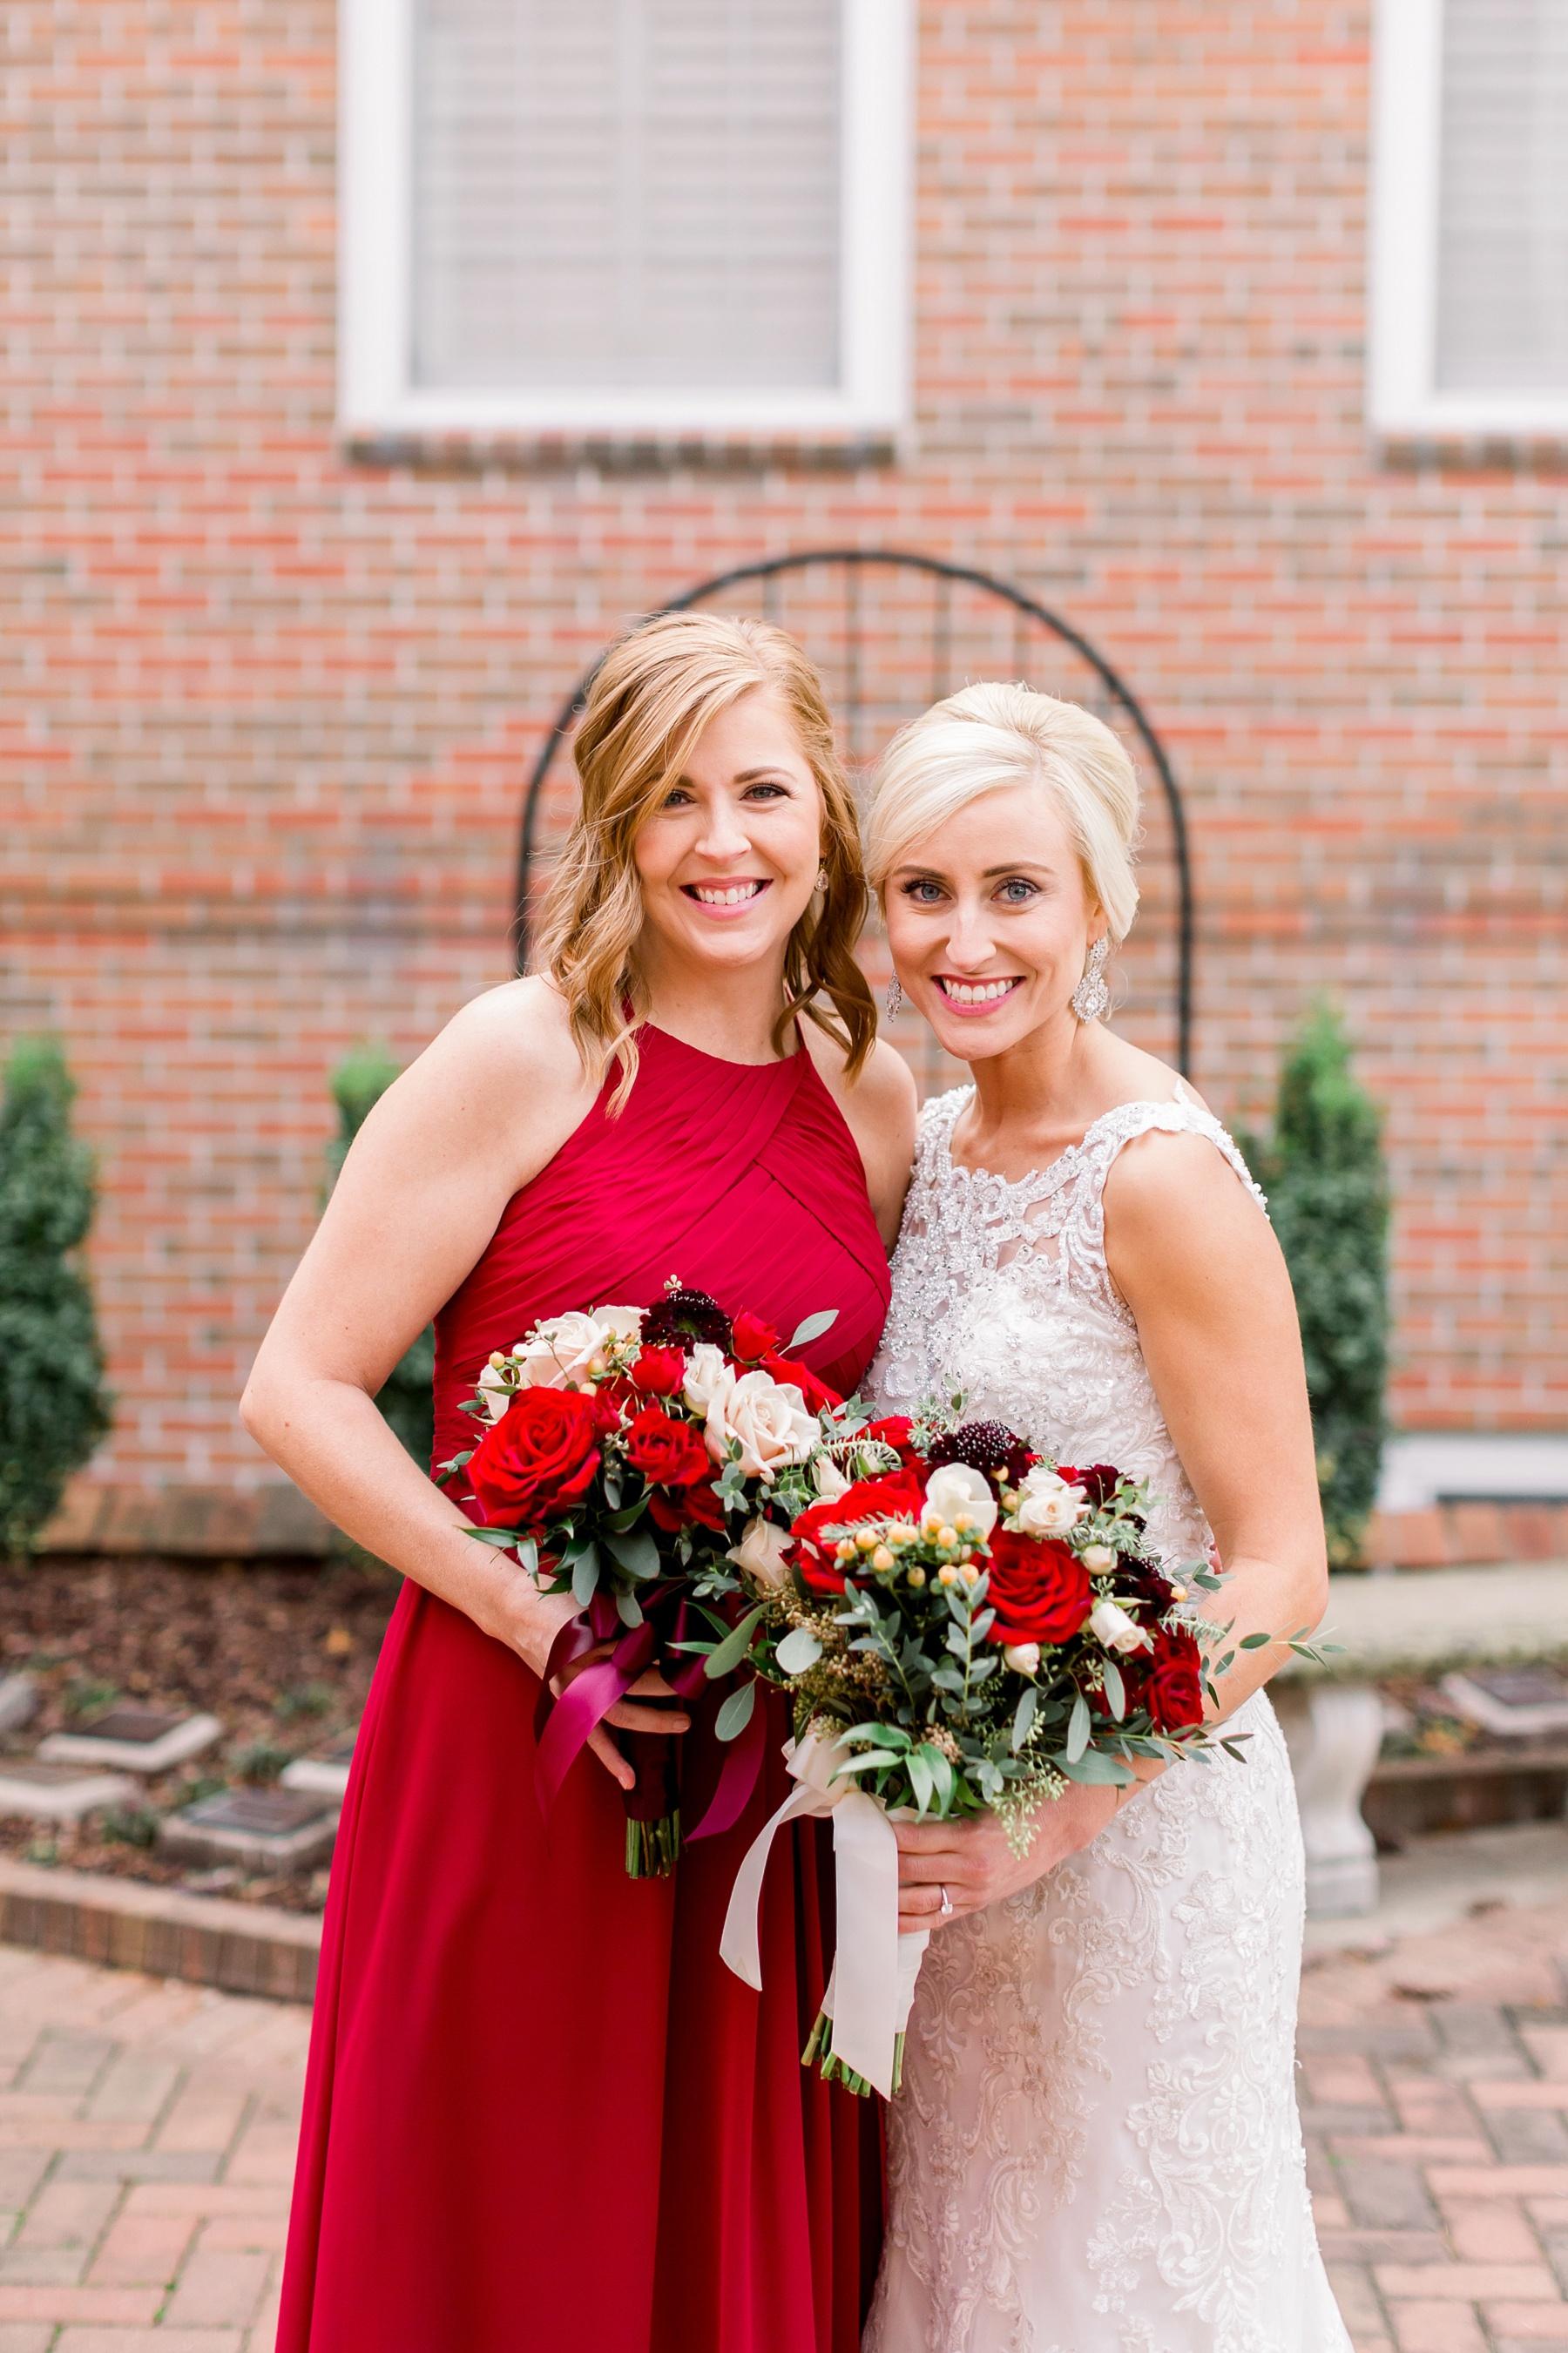 midwest-adventurous-wedding-photographer-elizabeth-ladean-photography-photo_4832.jpg